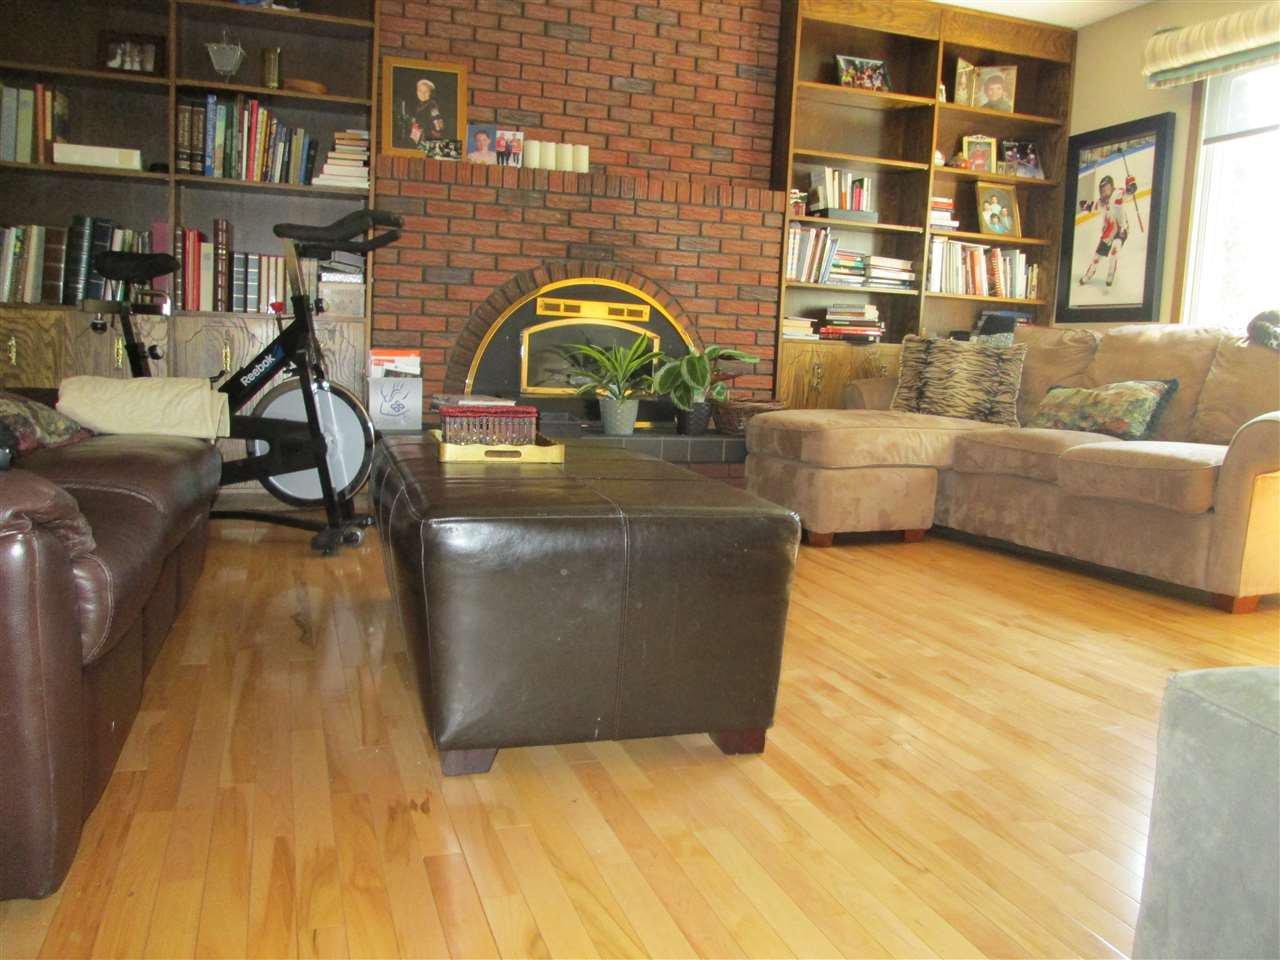 Main Photo: 3412 83 Street in Edmonton: Zone 29 House for sale : MLS®# E4172802